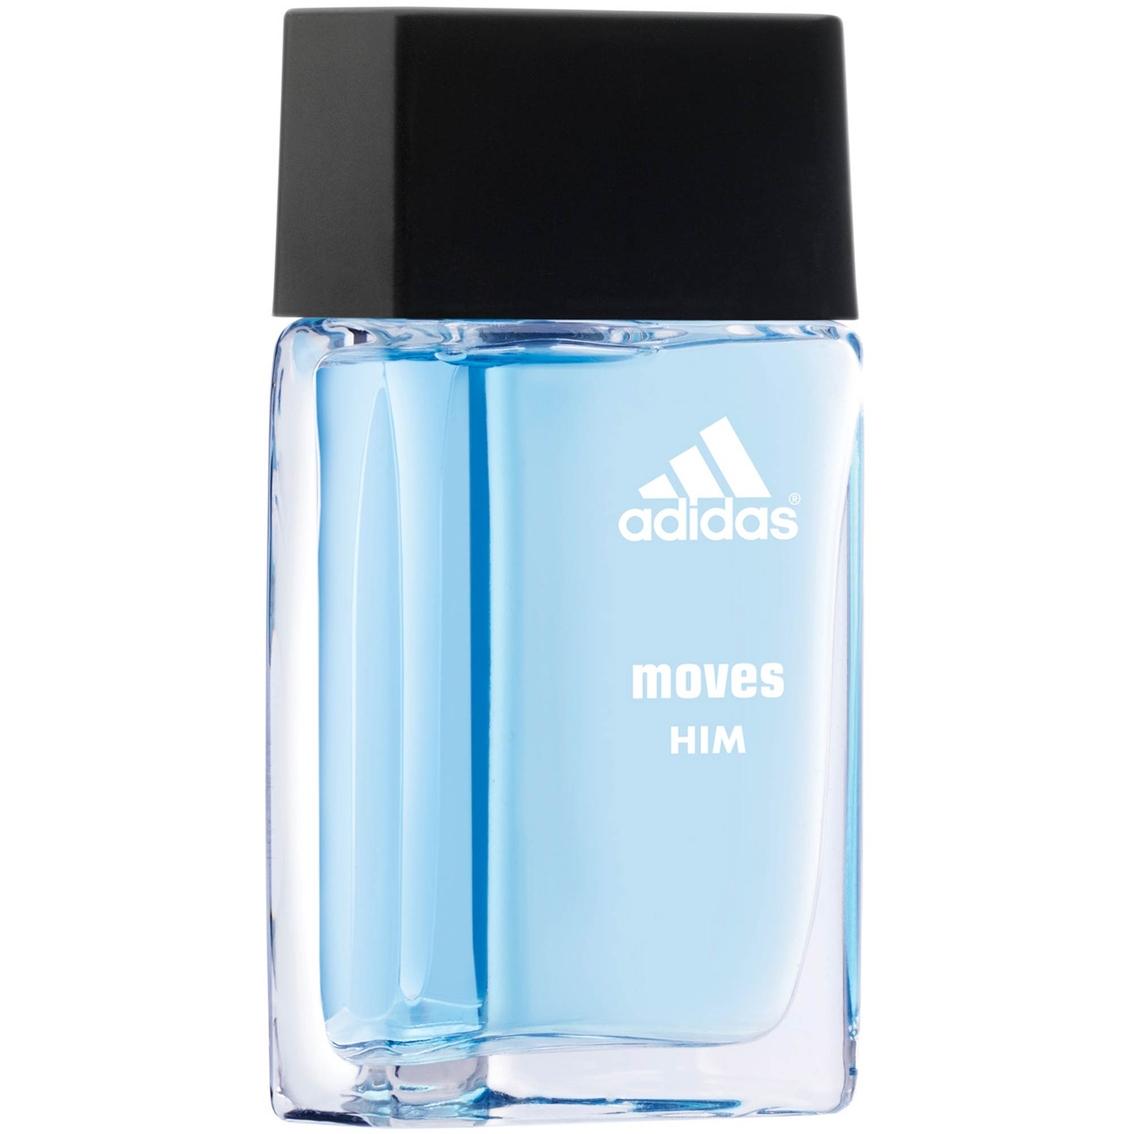 adidas moves eau de toilette spray men 39 s fragrances. Black Bedroom Furniture Sets. Home Design Ideas